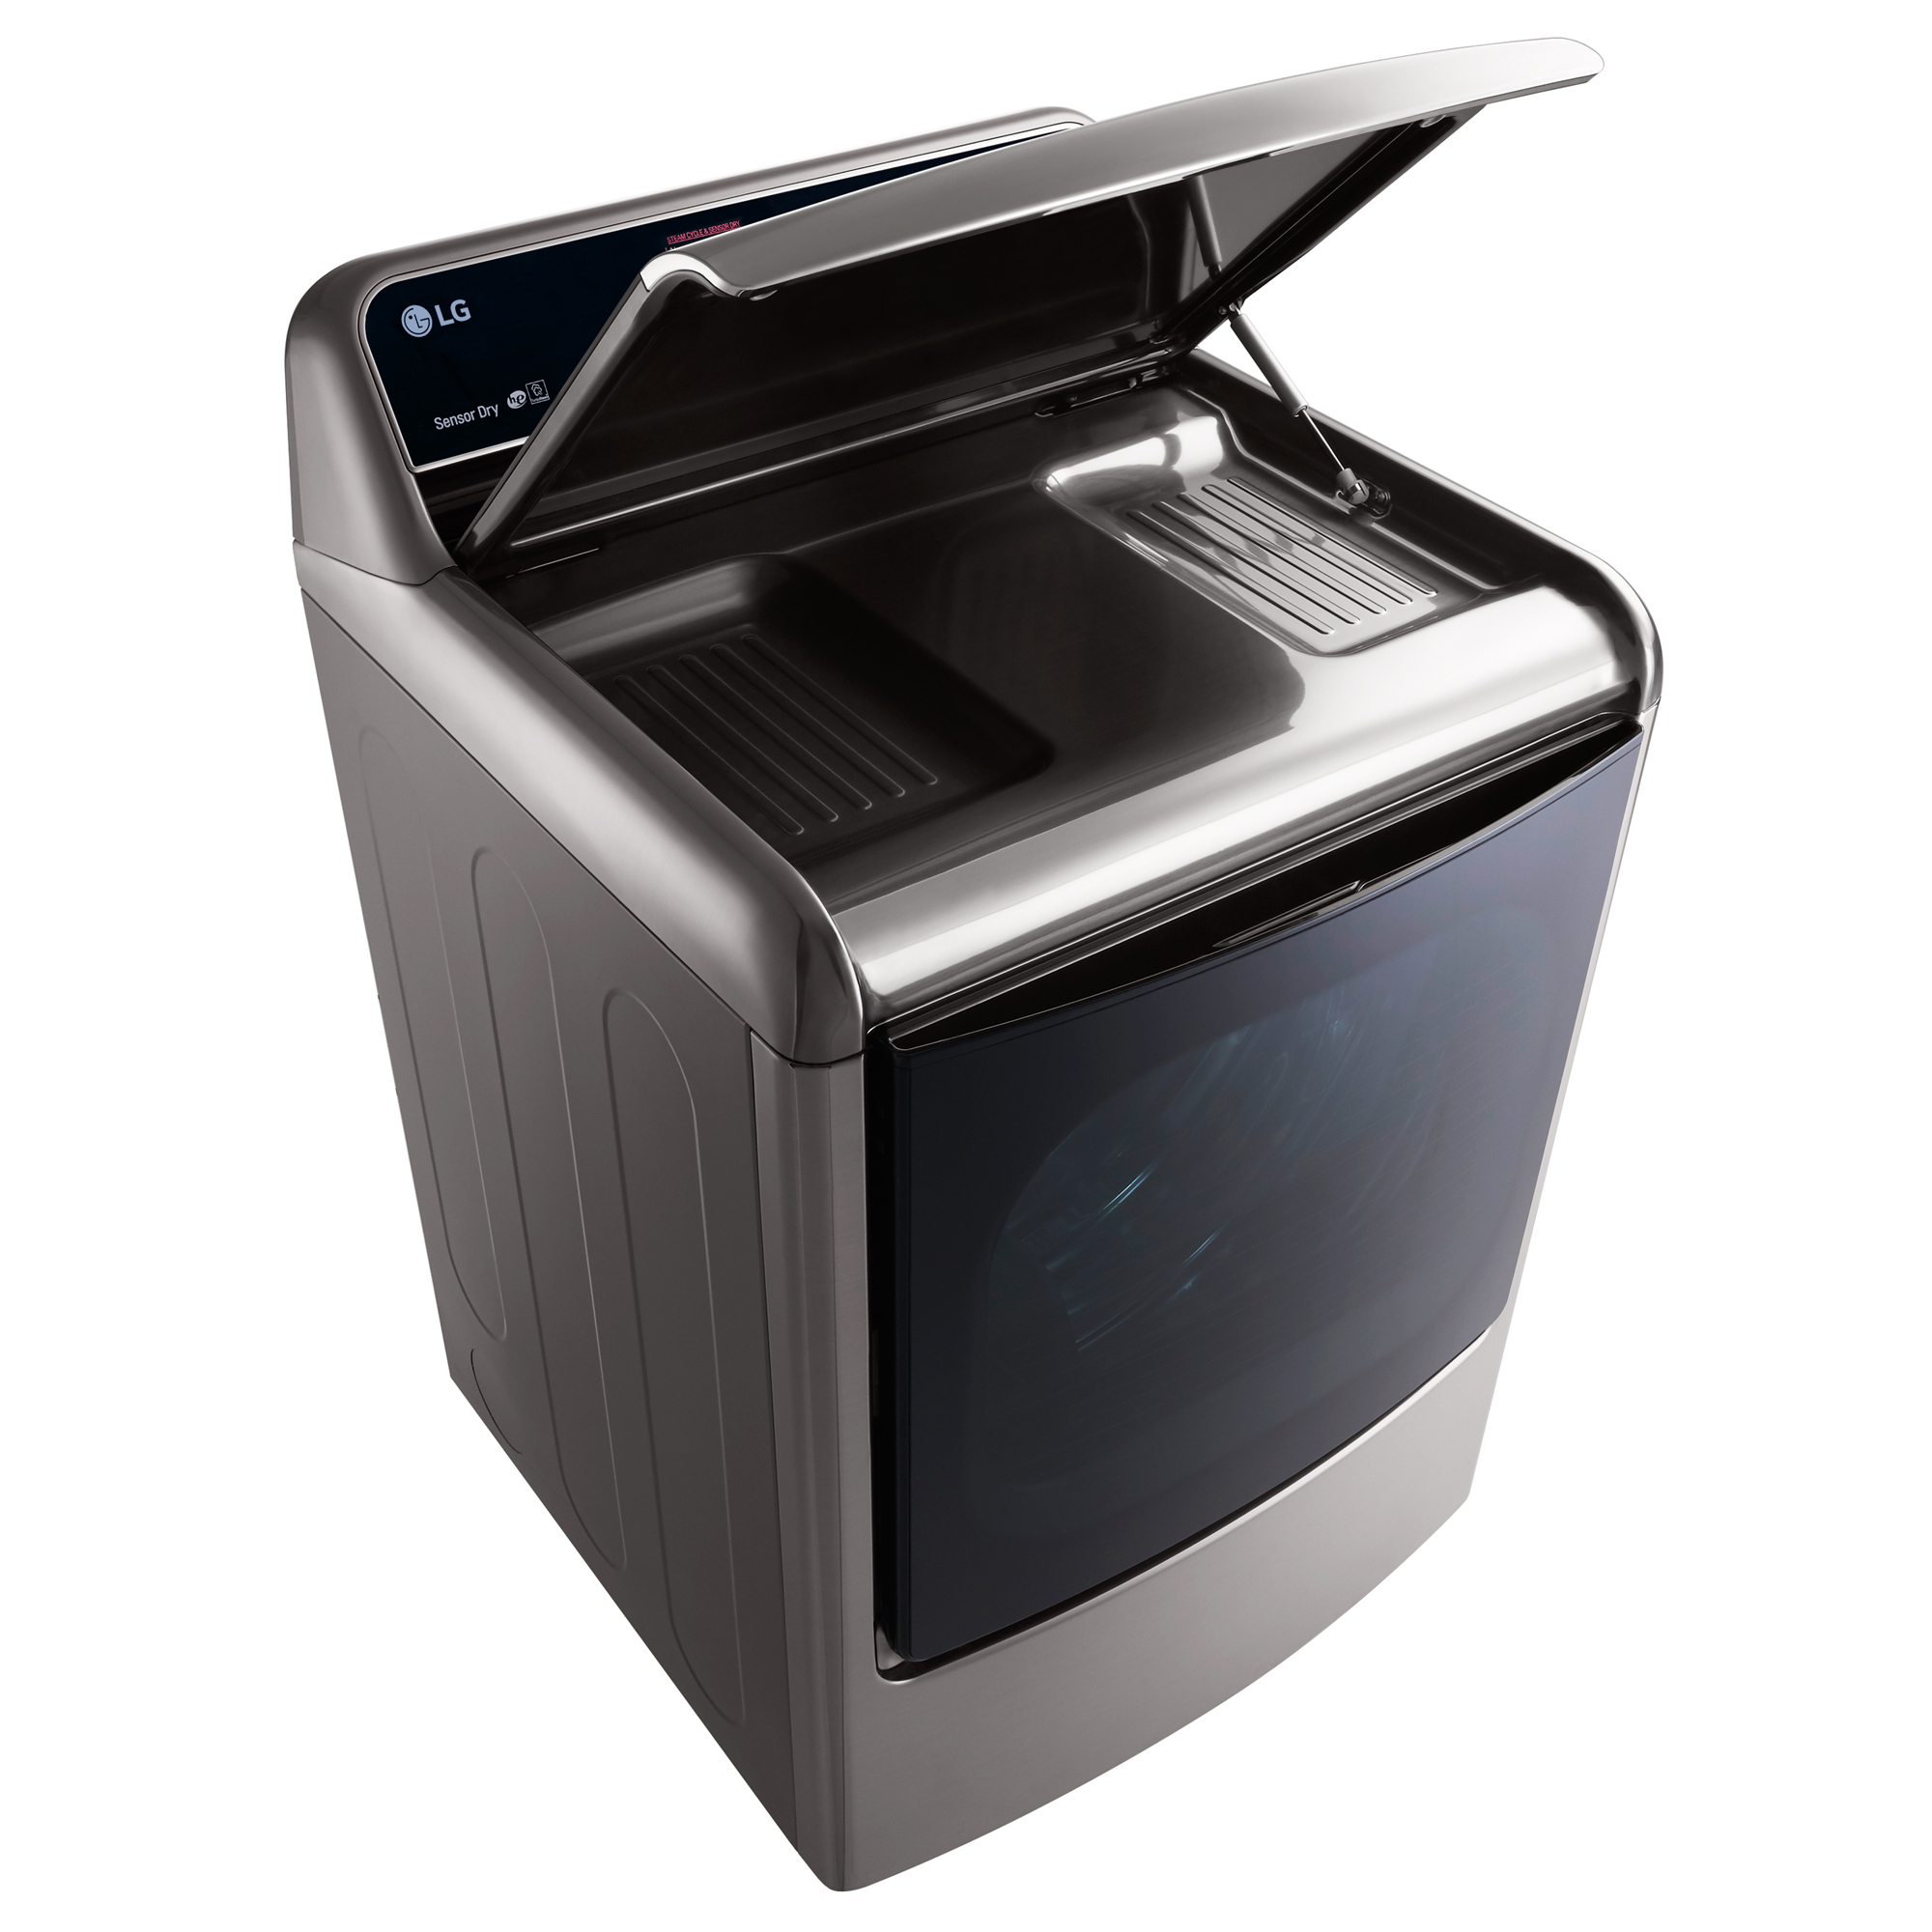 LG DLEX7700VE 9.0 cu.ft. TurboSteam™ Dryer w/LG EasyLoad™ Door – Graphite Steel